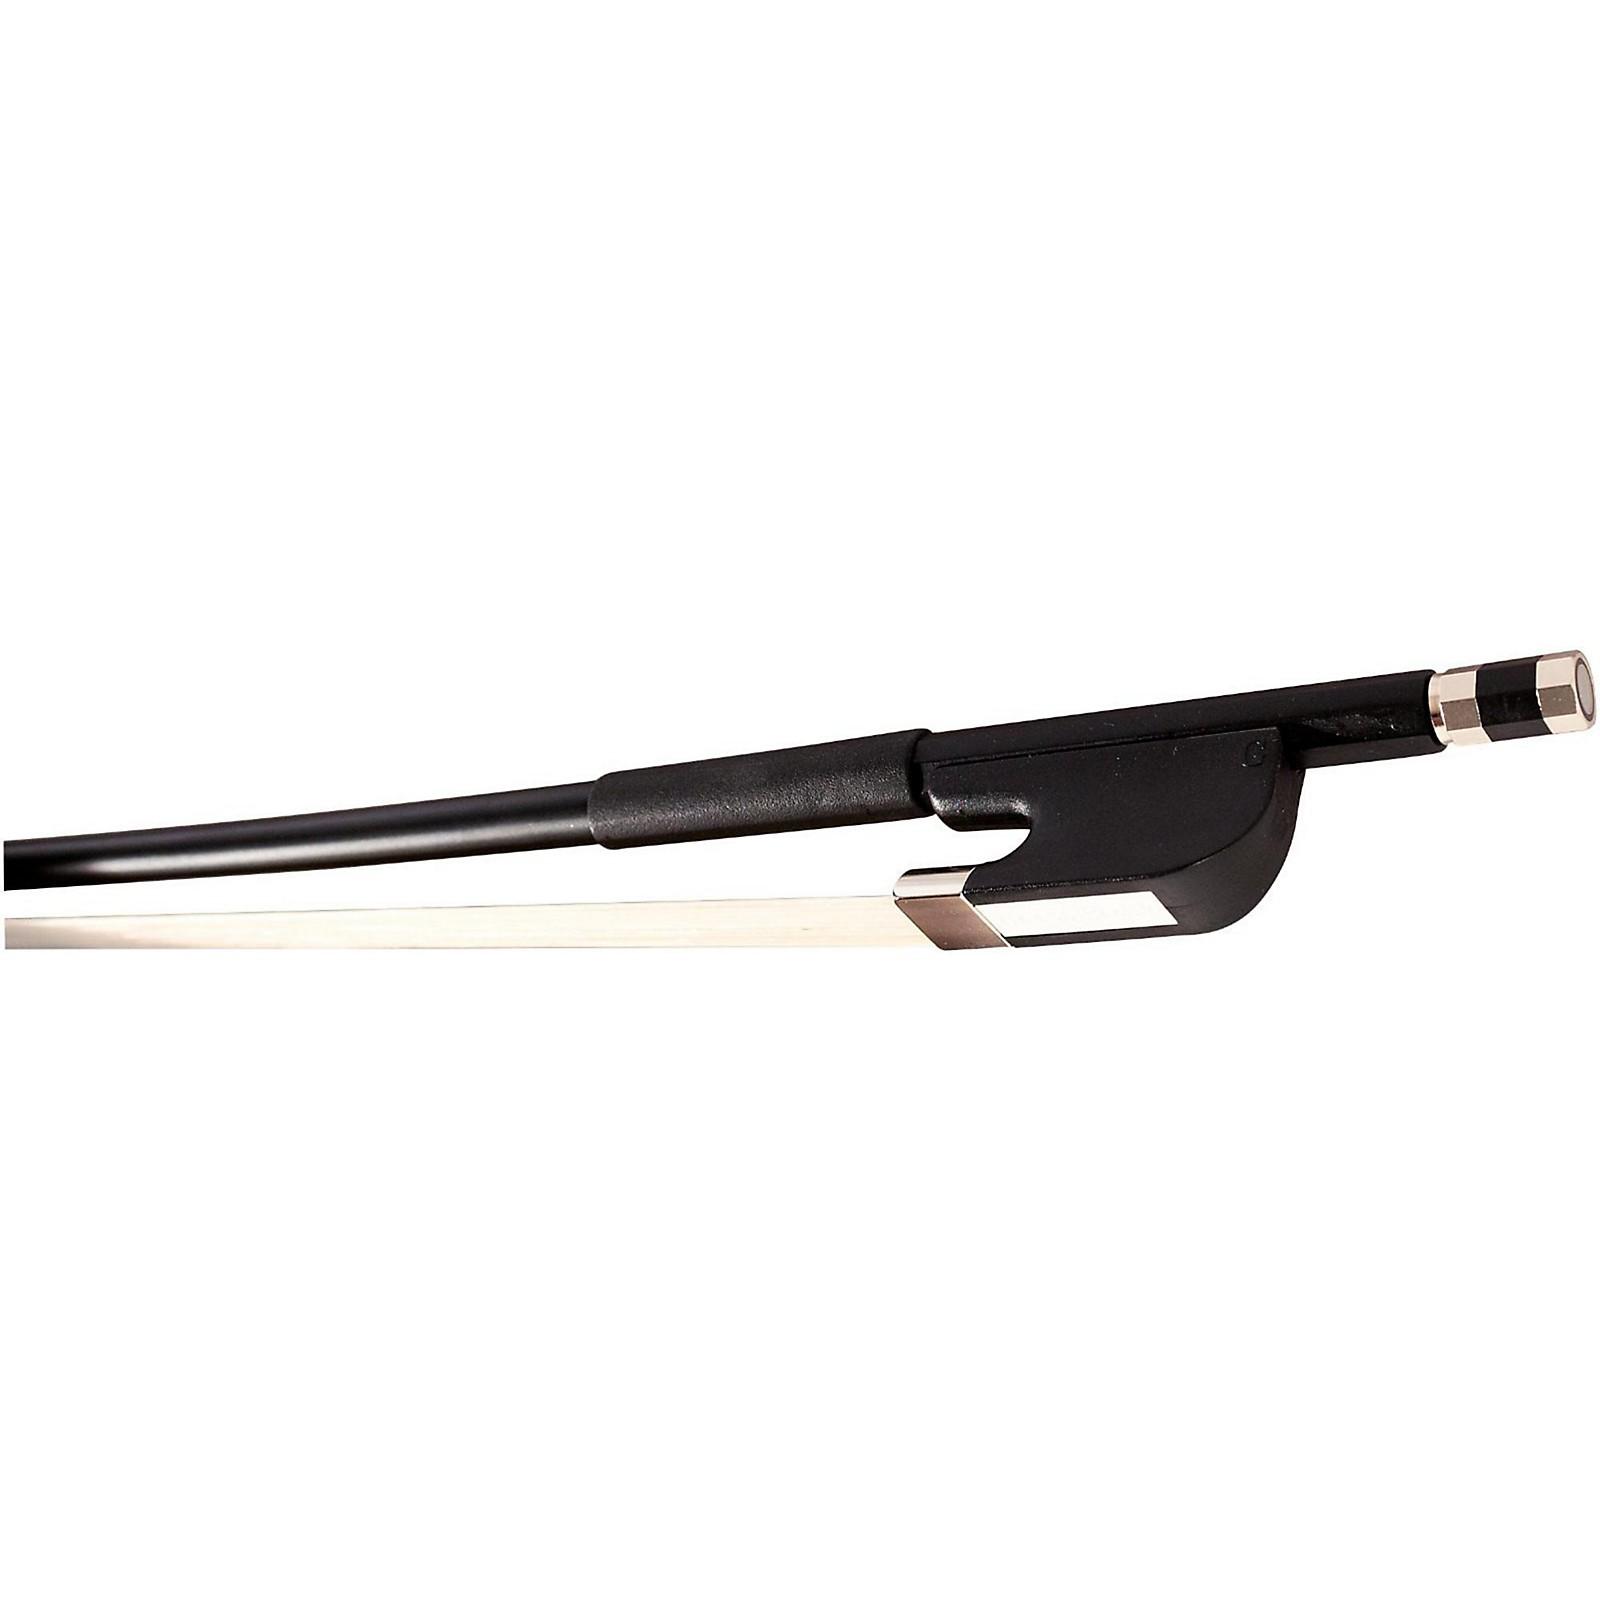 Glasser Bass Bow Fiberglass Half-Lined Frog Leatherette Grip